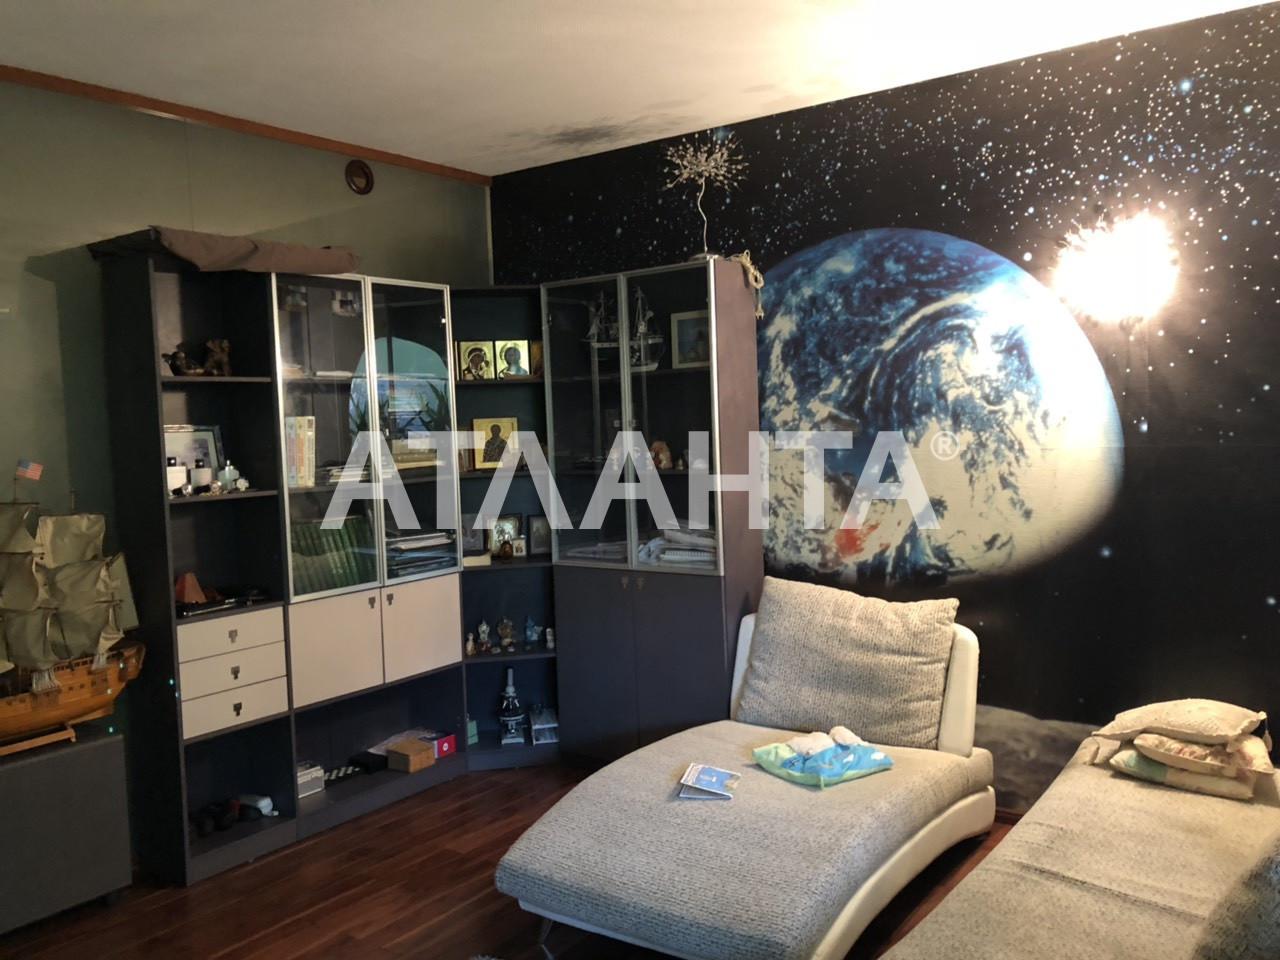 Продается 3-комнатная Квартира на ул. 1 Мая — 135 000 у.е. (фото №4)